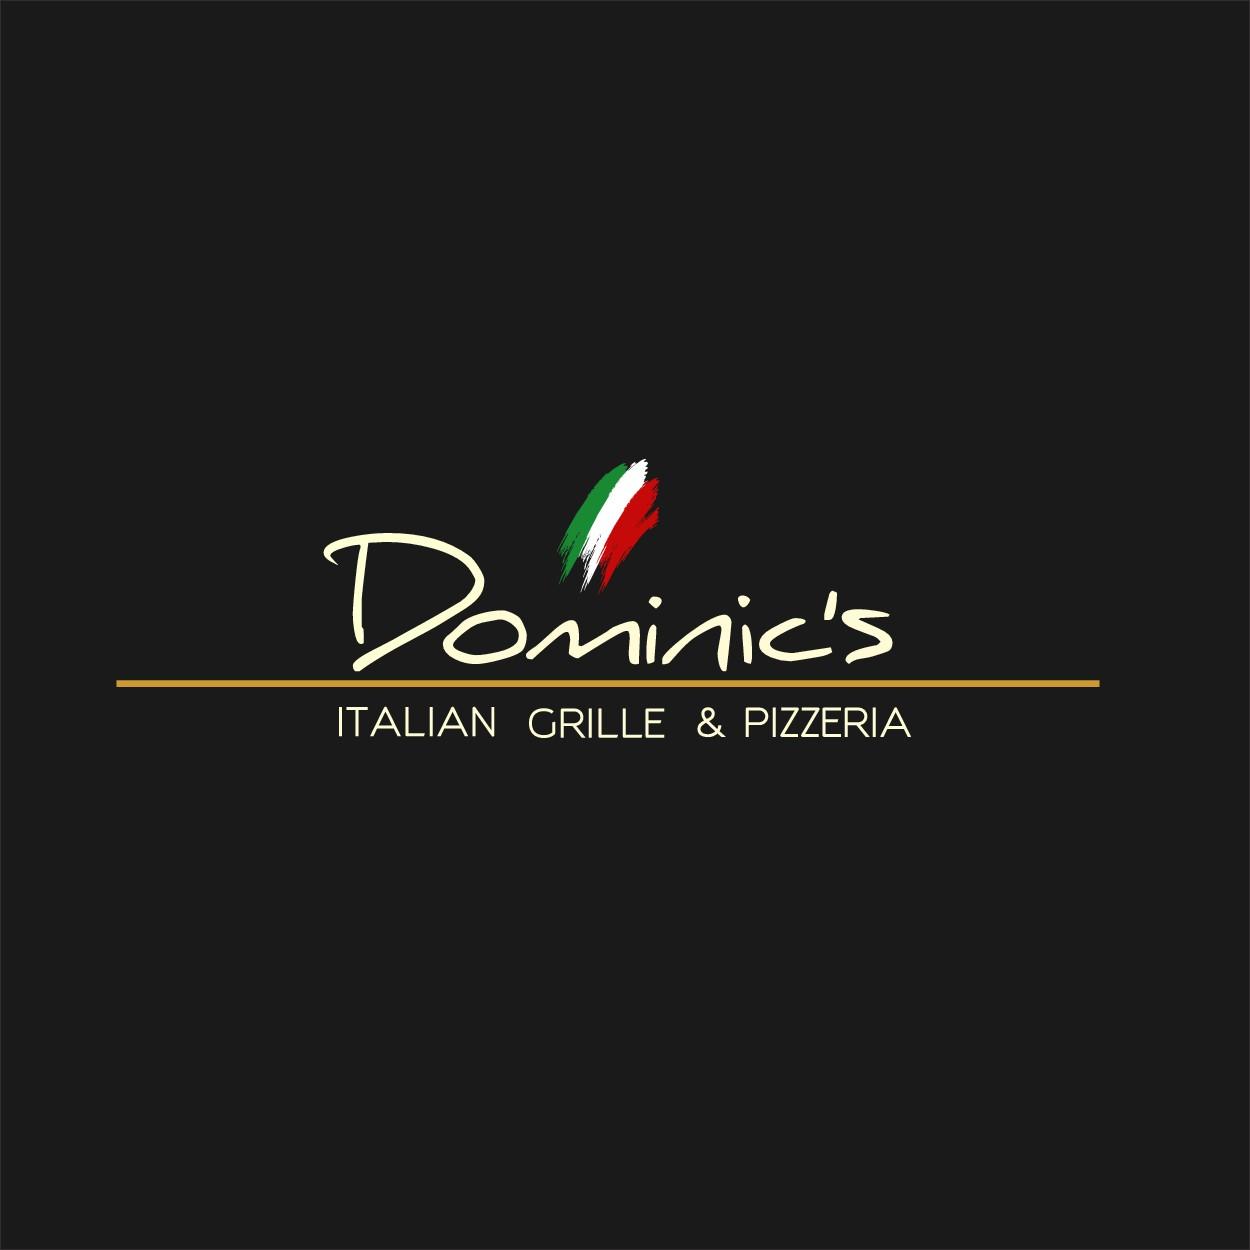 Italian ristorante & pizzeria logo